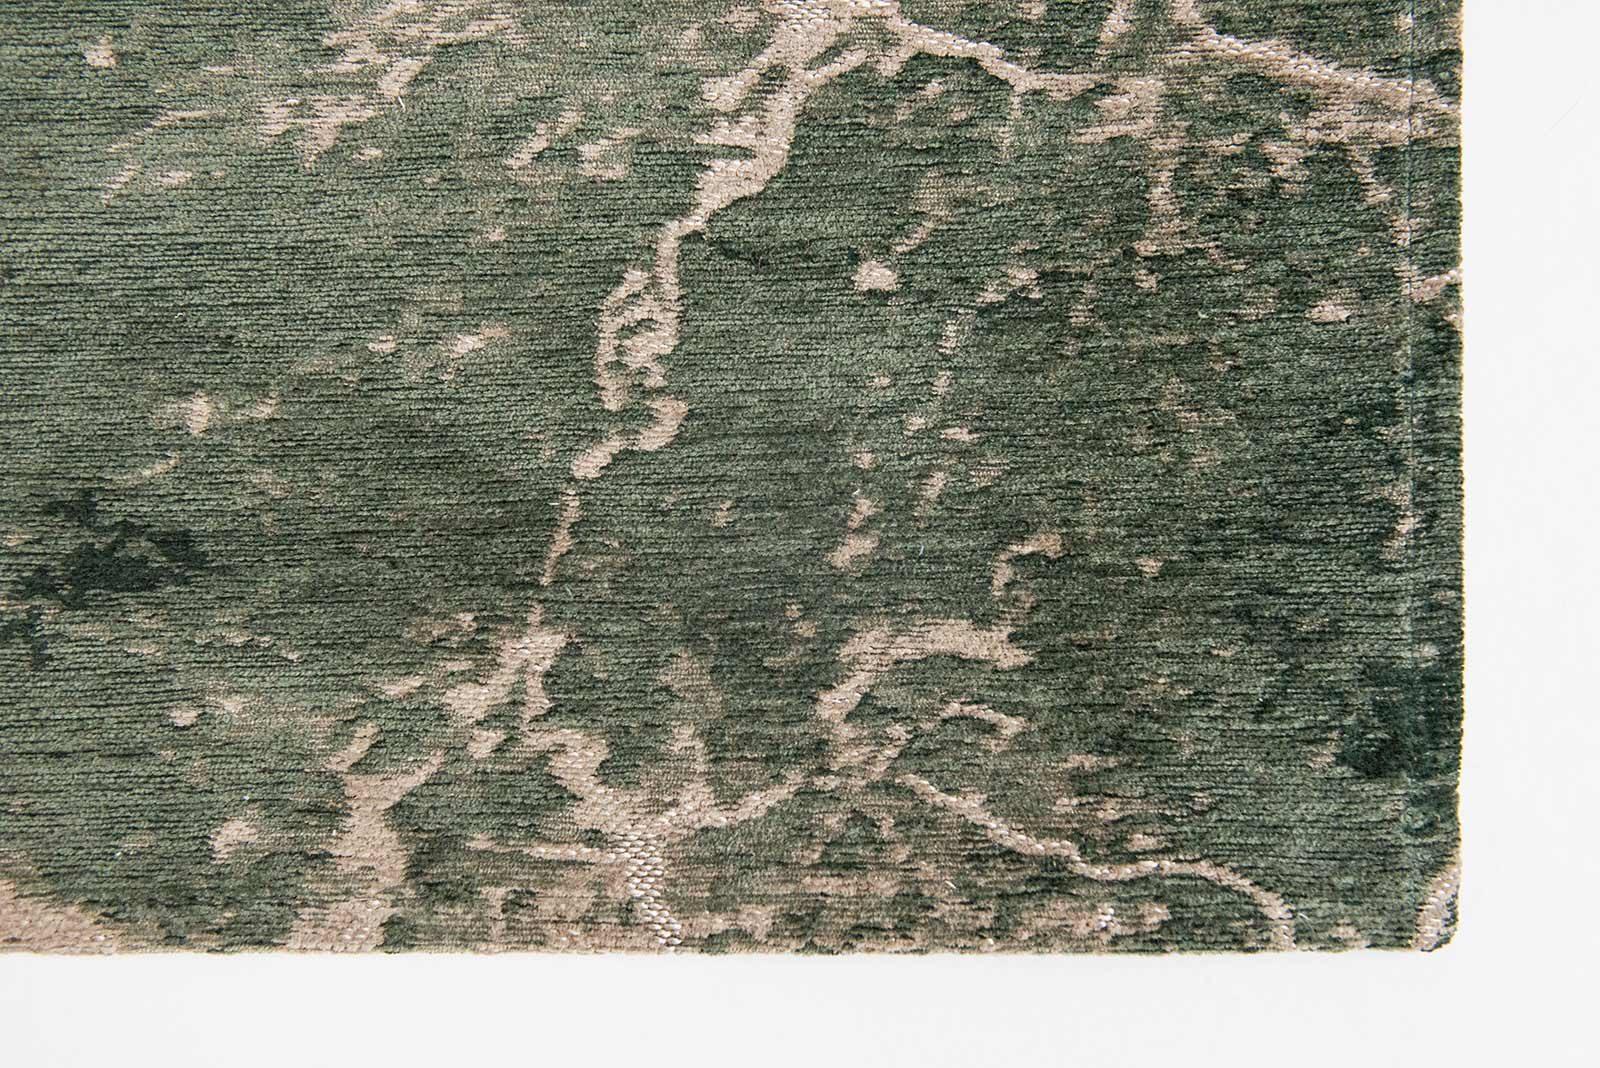 rugs Louis De Poortere LX8723 Mad Men Cracks Dark Pine zoom 3